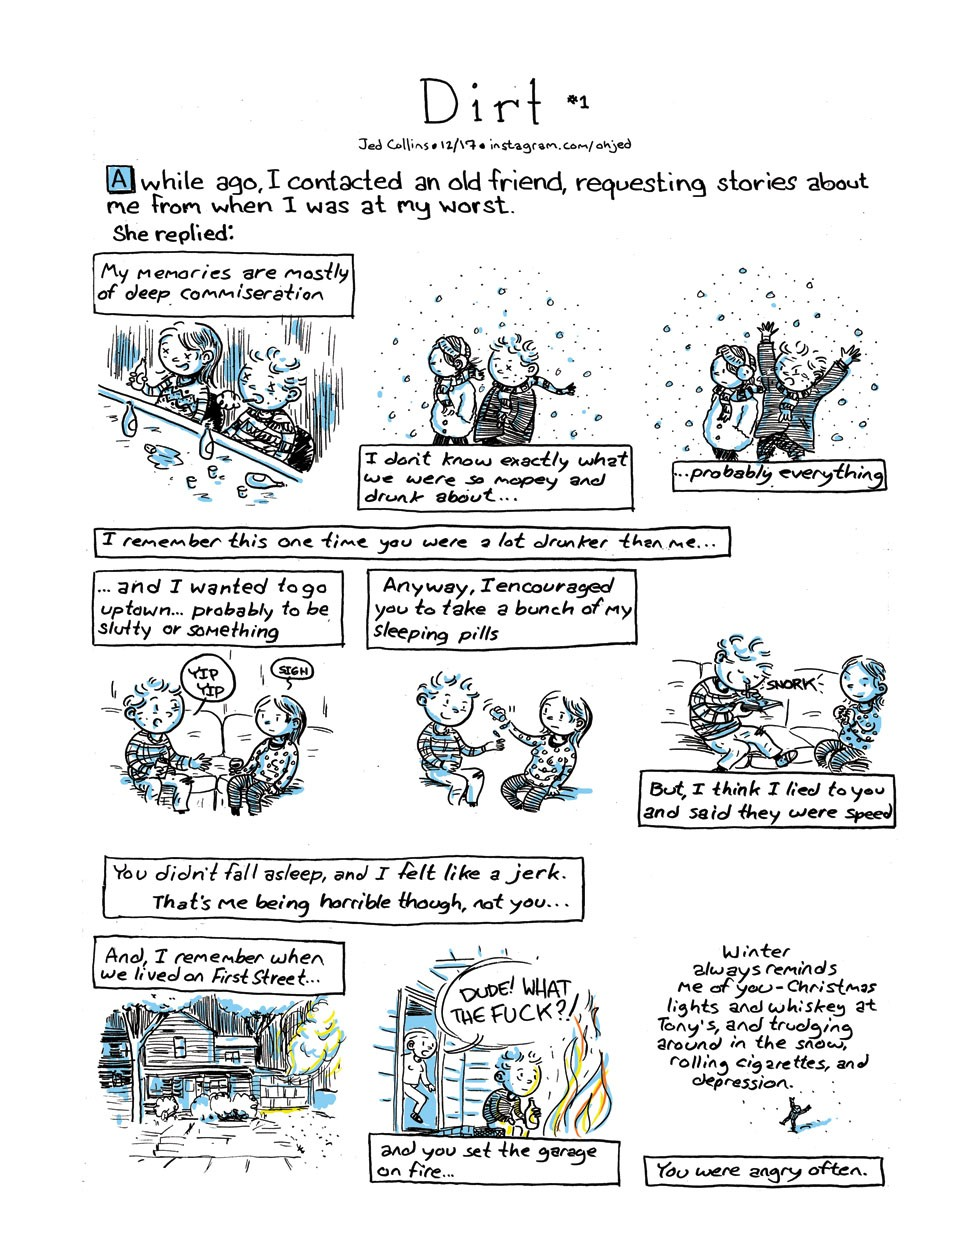 scene_comics_2018_jc.jpg